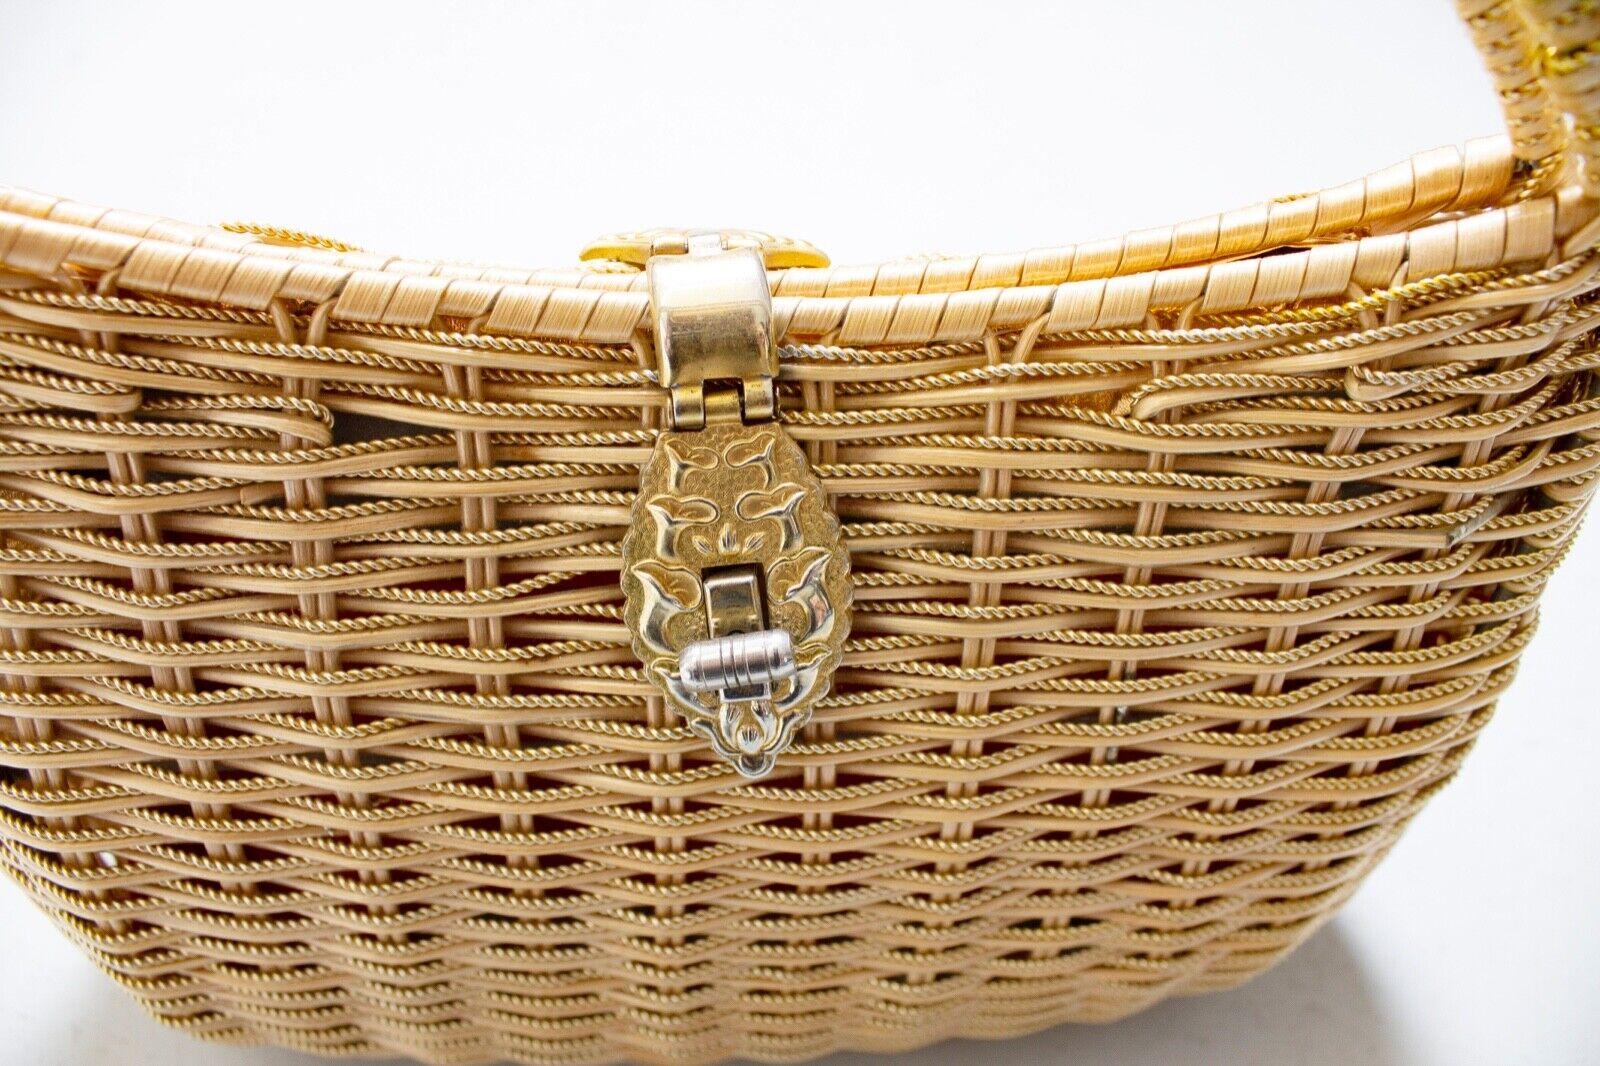 Vintage Basket Purse 1960s Gold Metal Woven Wicke… - image 8